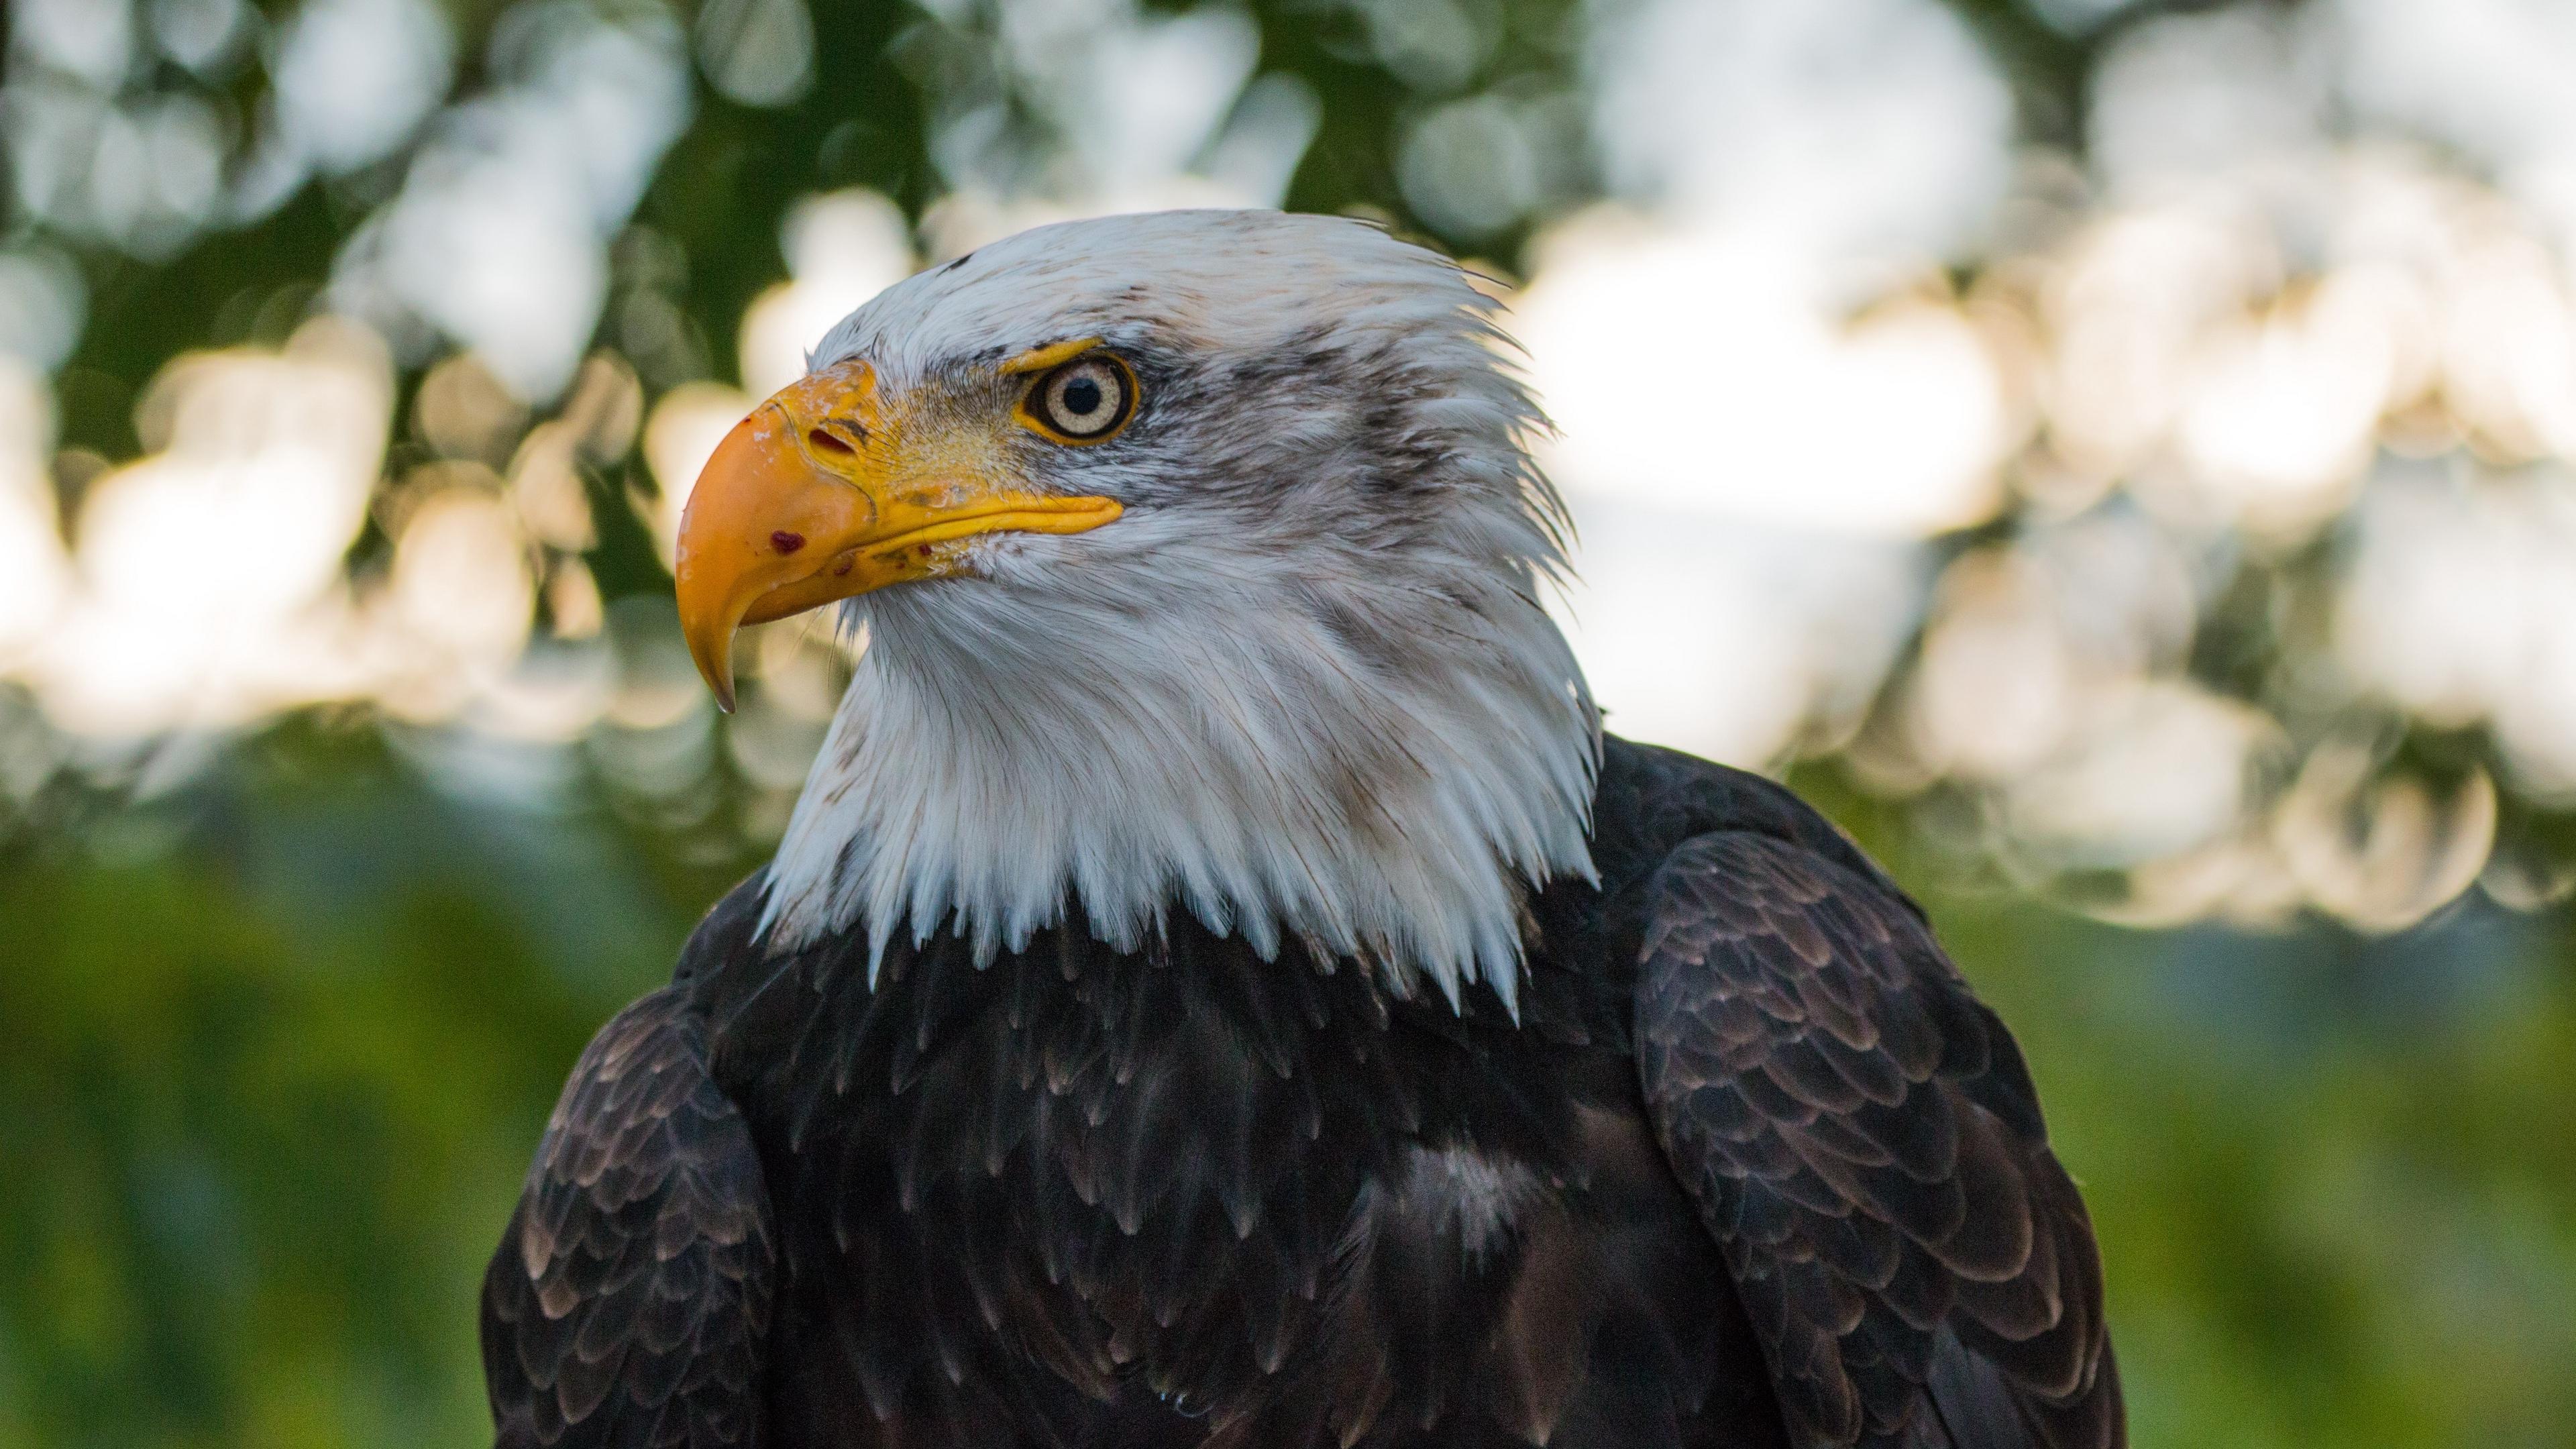 bald eagle eagle bird predator 4k 1542242434 - bald eagle, eagle, bird, predator 4k - Eagle, Bird, bald eagle